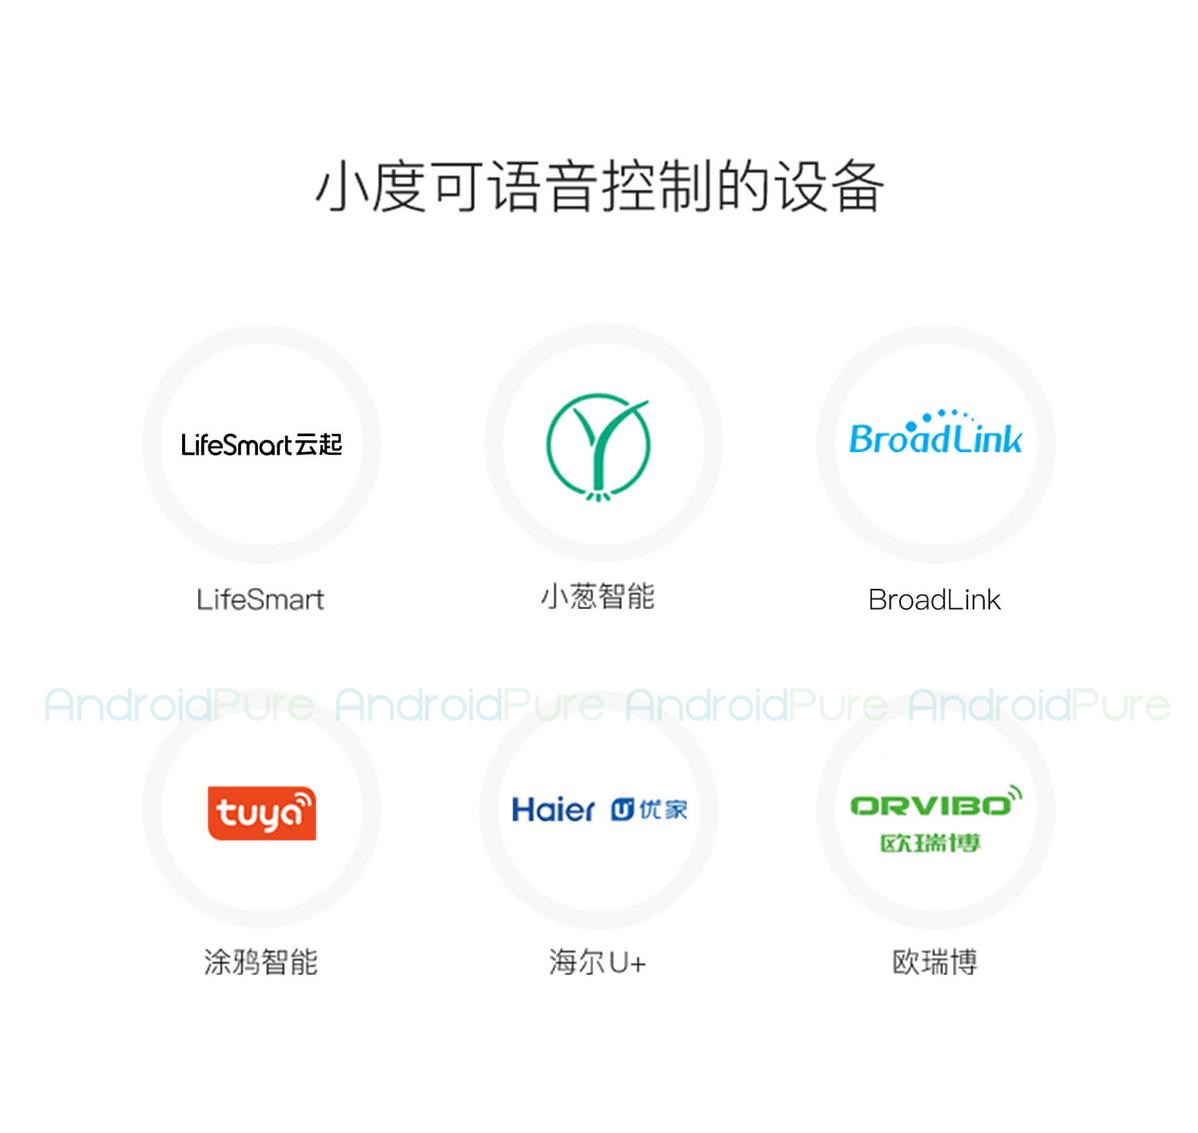 Moto AI Speakers Amazon Echo2 All about Motorola AI Assistant speakers, like Amazon Echo or Google Mini [Updated] 5